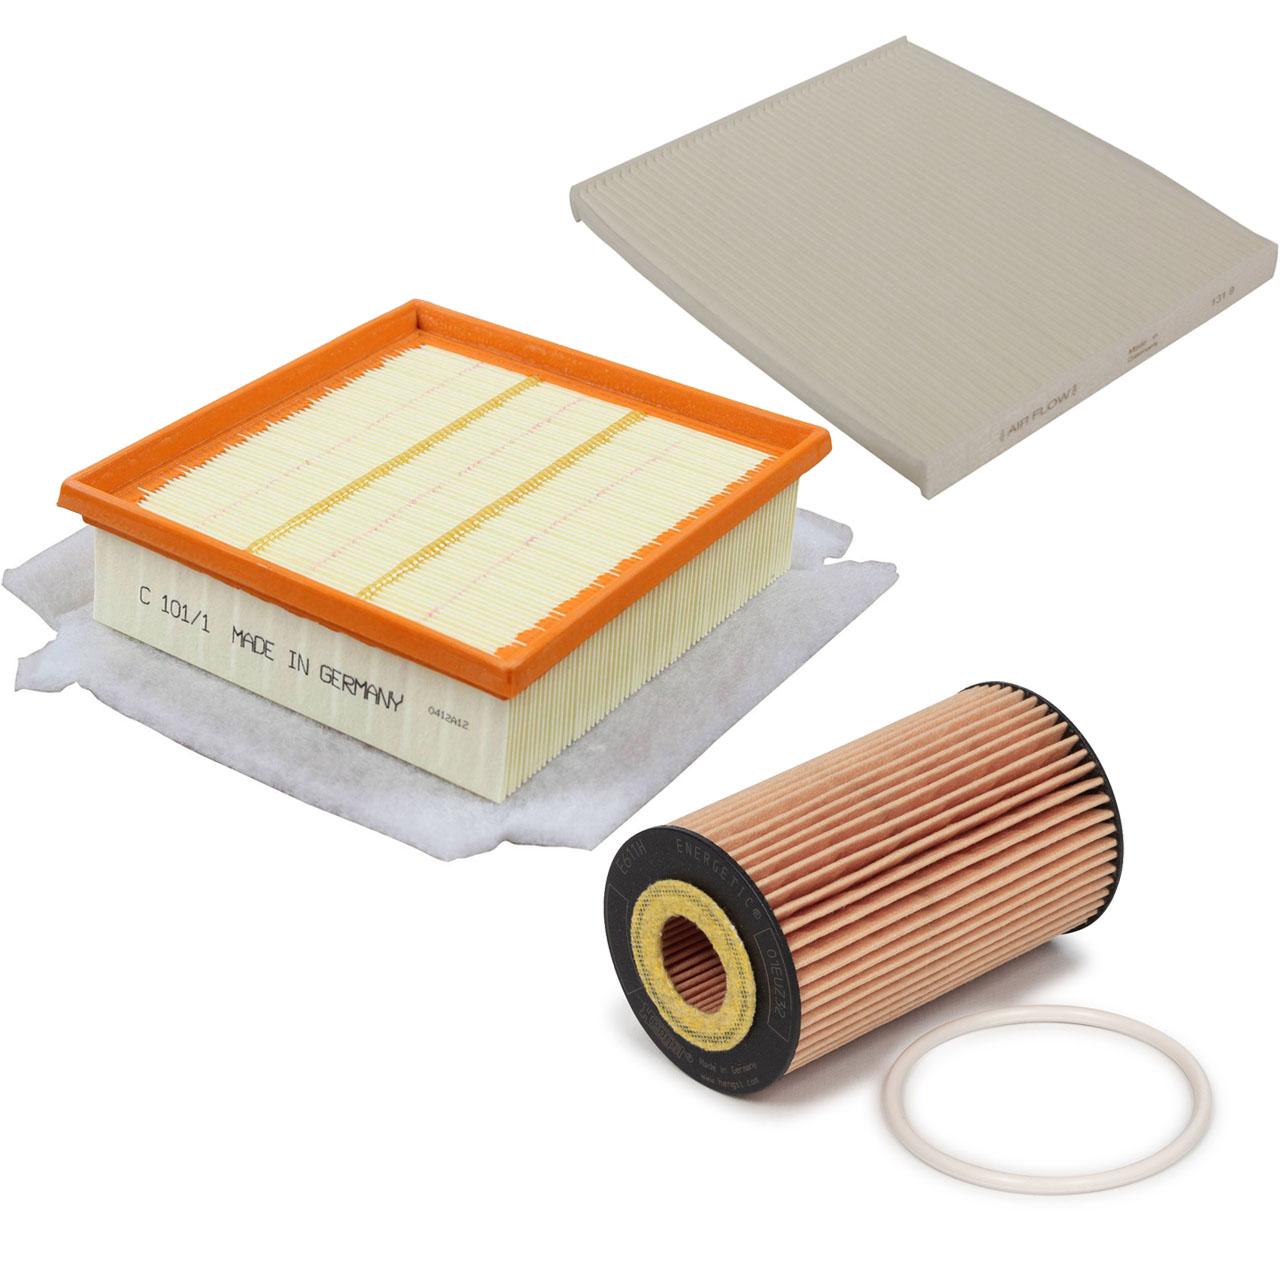 Inspektionskit Filterpaket Filterset für Opel Corsa D 1.4 1.6Turbo OPC 120-211PS